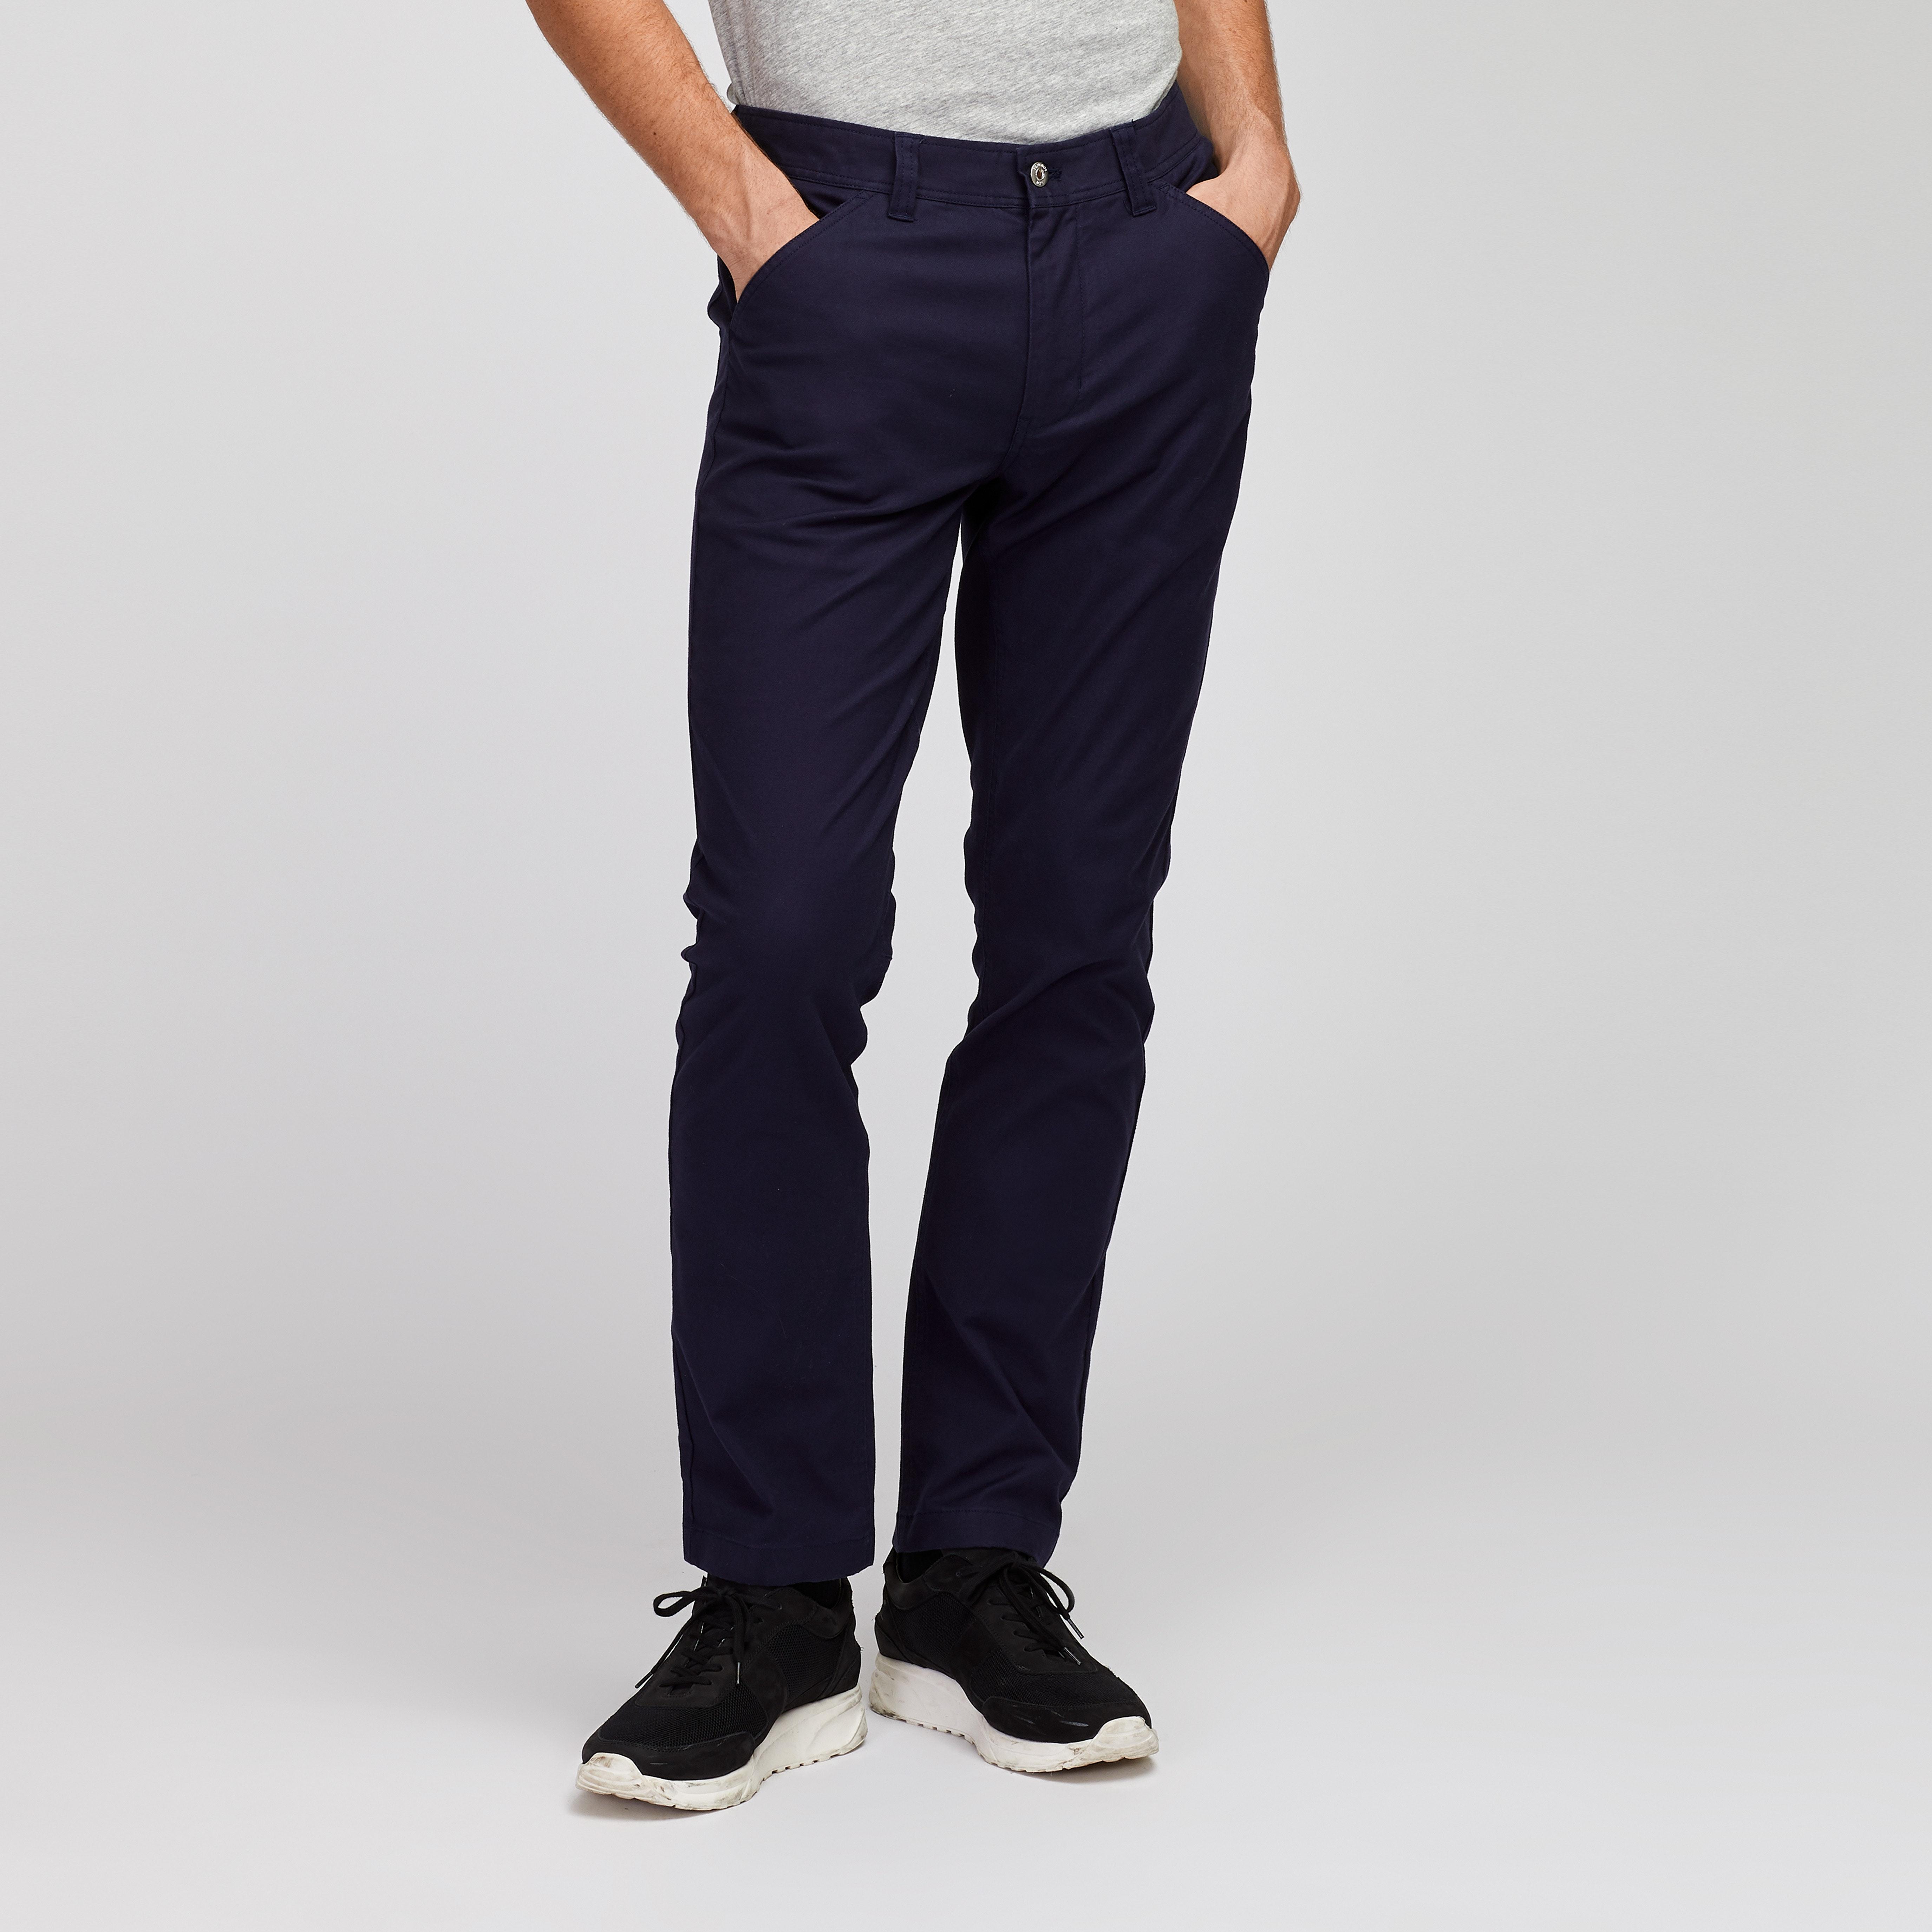 Canvas Workwear Pant